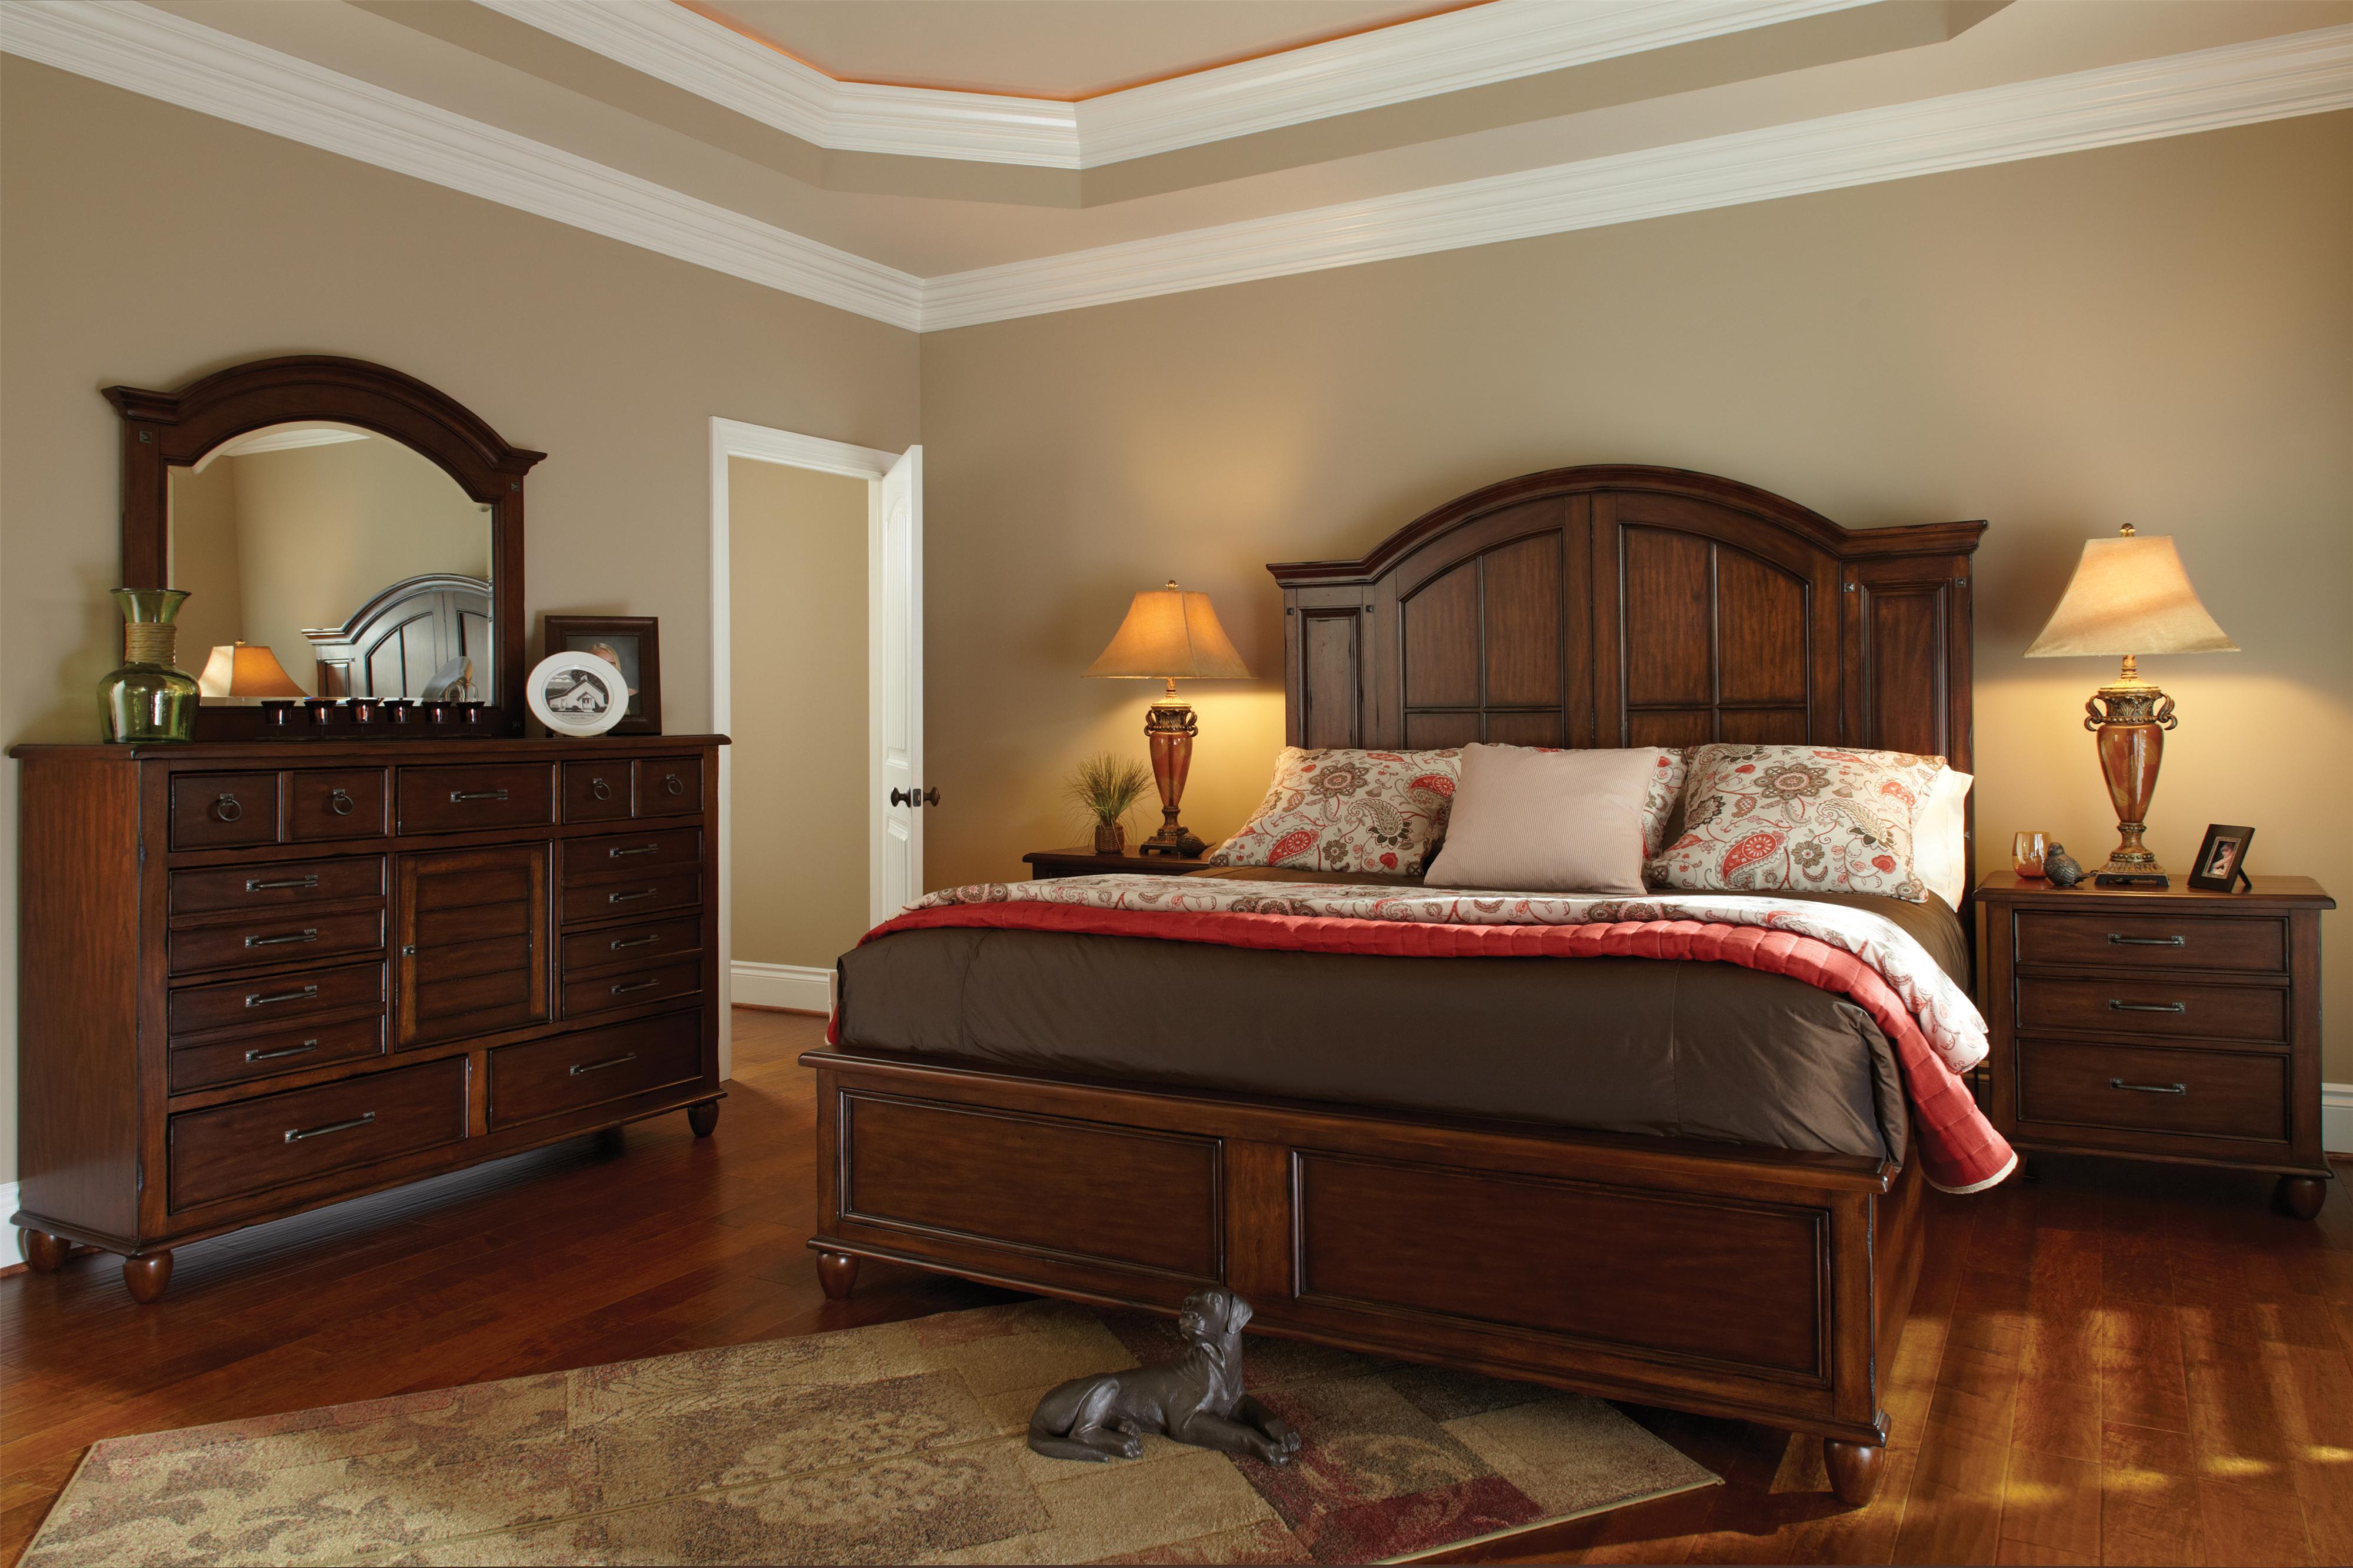 Good Carolina Preserves By Klaussner Blue Ridge King Bedroom Group   Item  Number: 426 K Bedroom